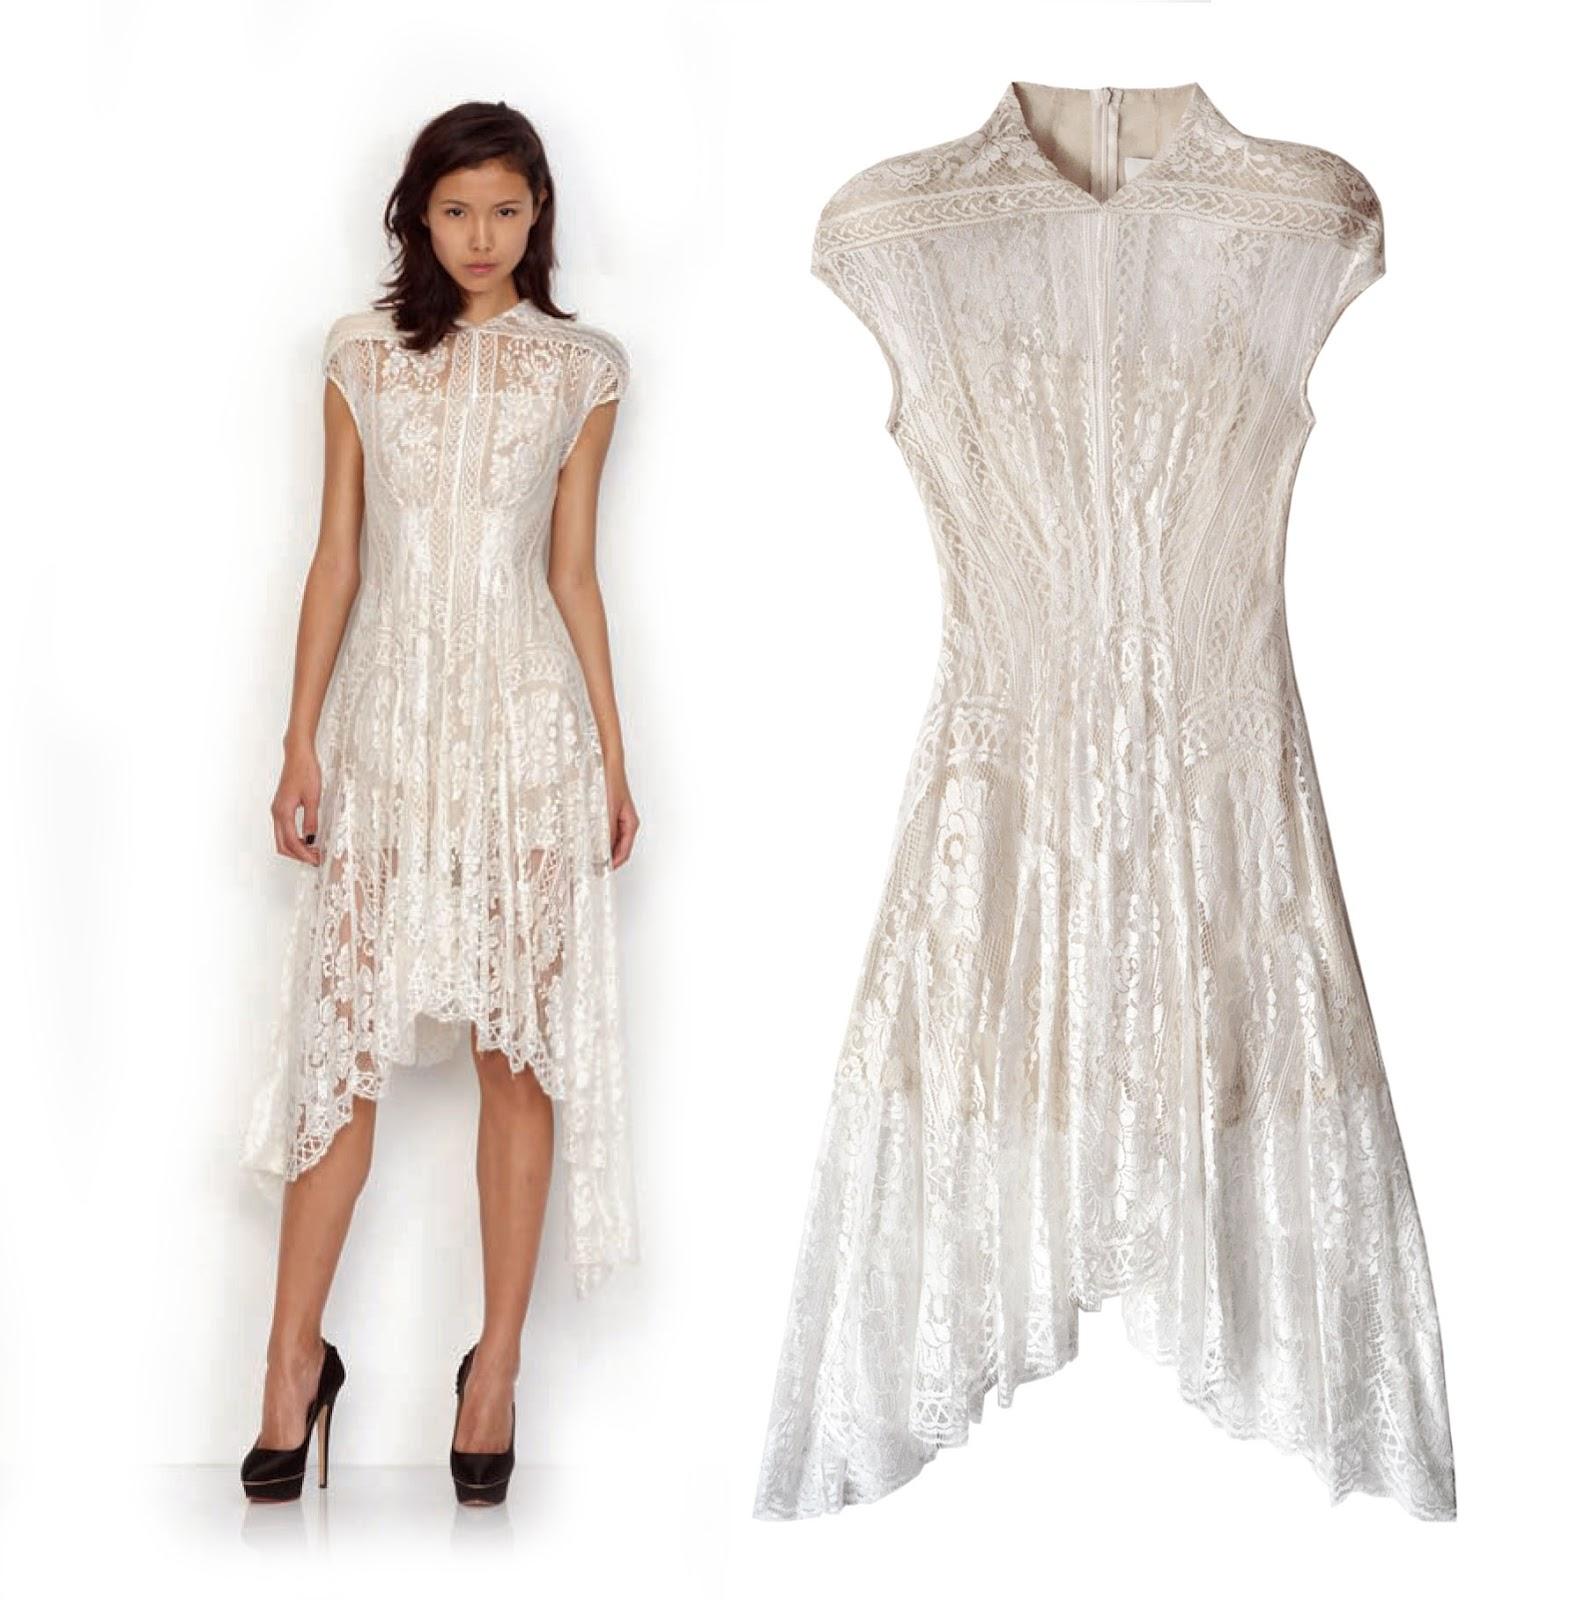 wiccan wedding dresses | Wedding dresses 2013